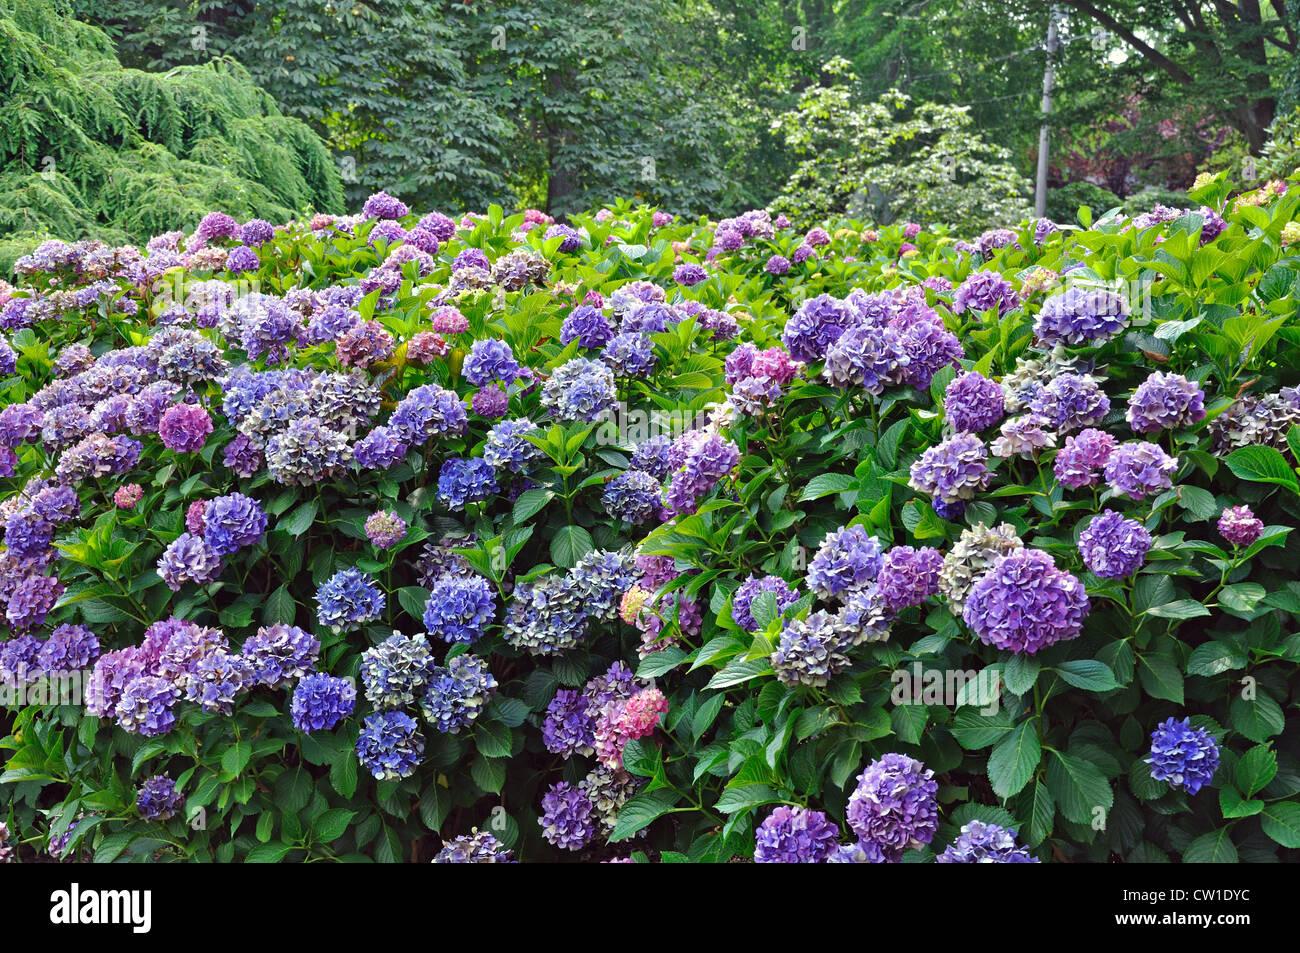 bl te lila hortensien busch stockfoto bild 49820048 alamy. Black Bedroom Furniture Sets. Home Design Ideas